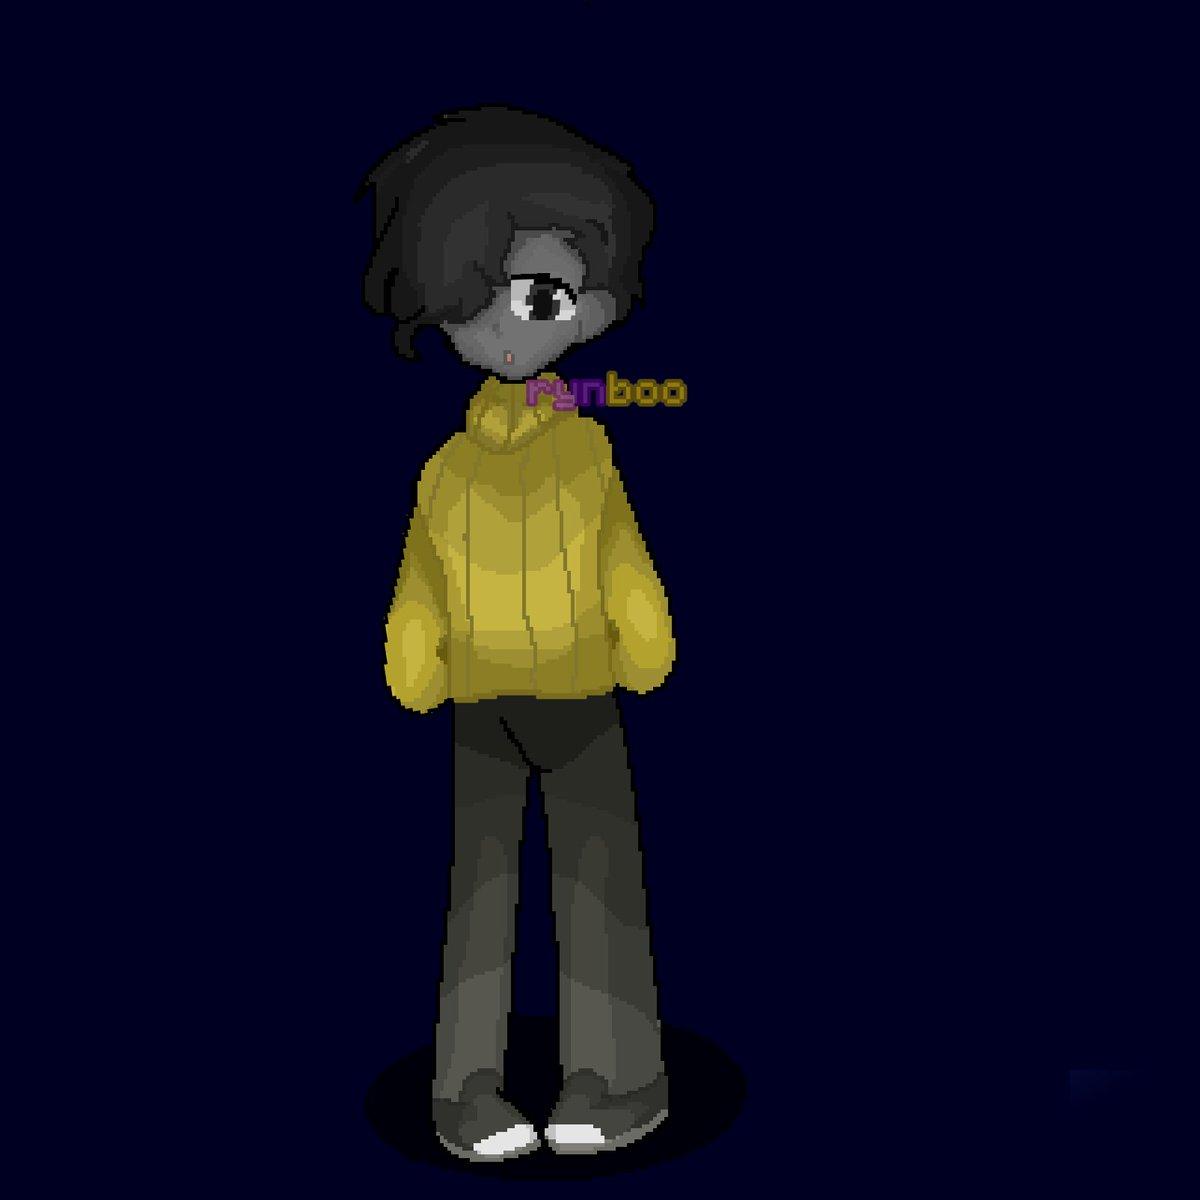 •pixel boys ° ° • - _ . #wilbursootfanart #wilburfanart #ghostbur #ghostburfanart  ---------------------------------------------------------- ..boo? ---------------------------------------------------------- RTS appreciated but not needed :] mobile layout so F pc users